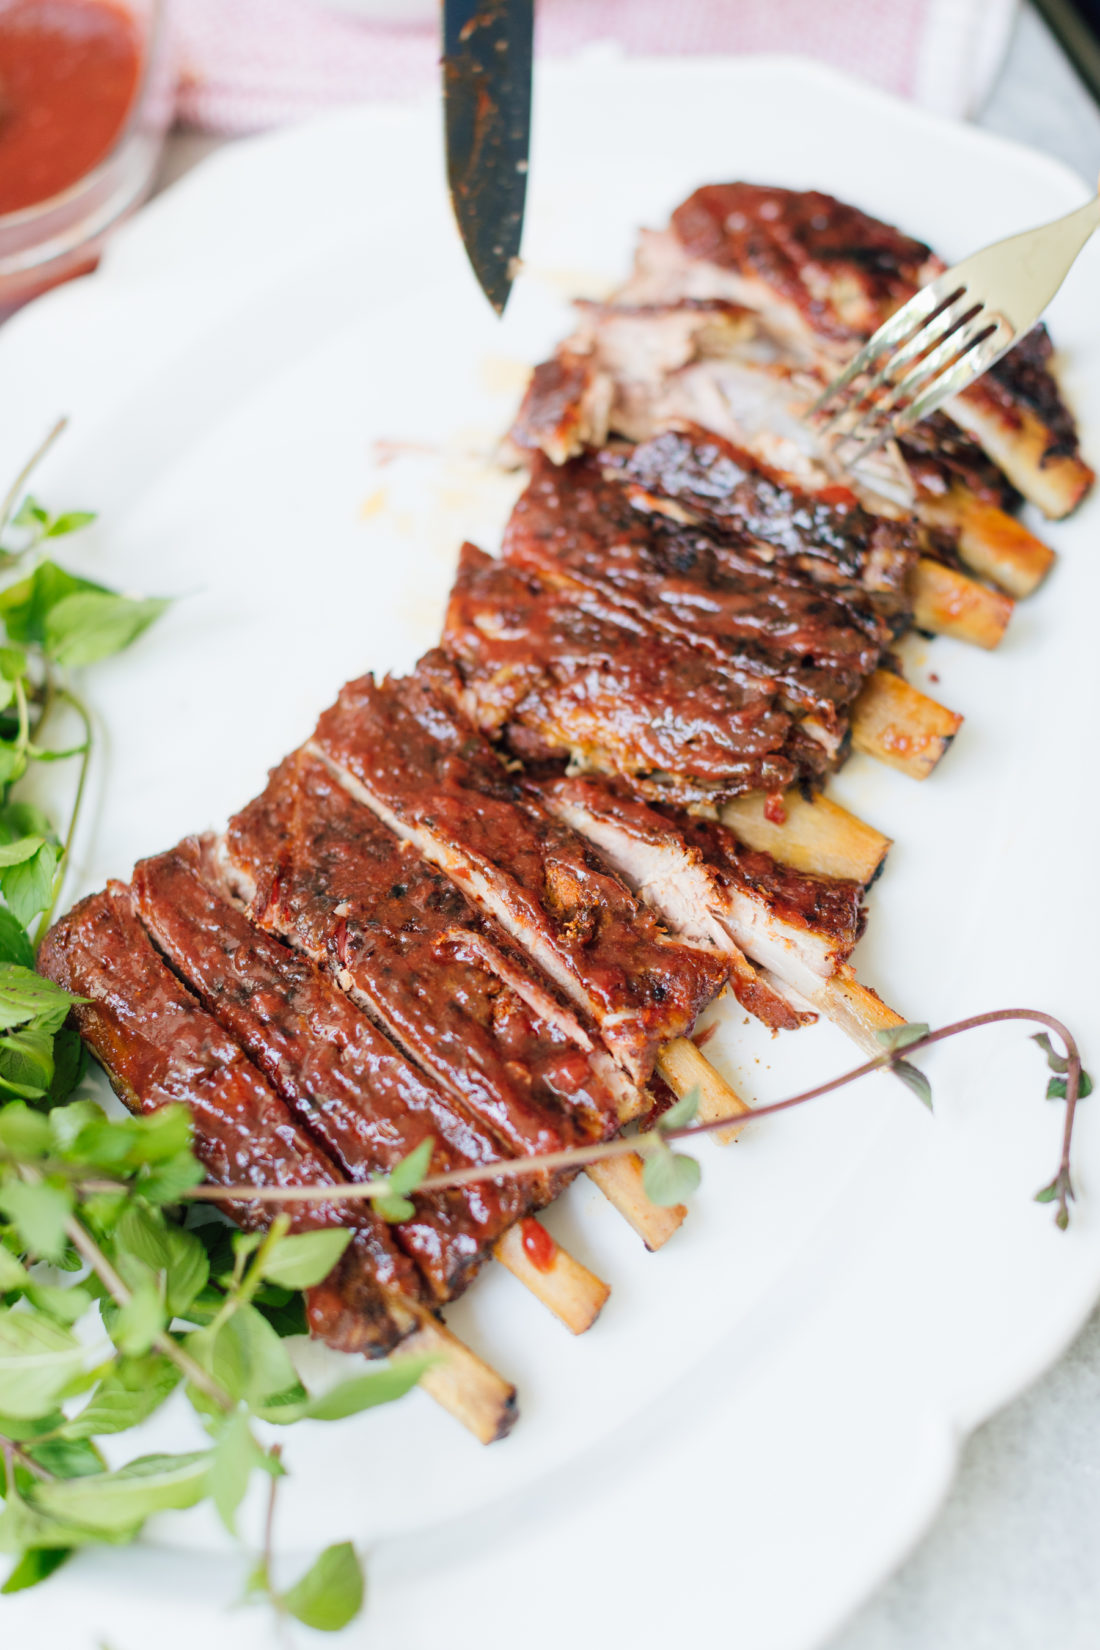 Eva Amurri Martino cuts her rack of ribs on a serving dish